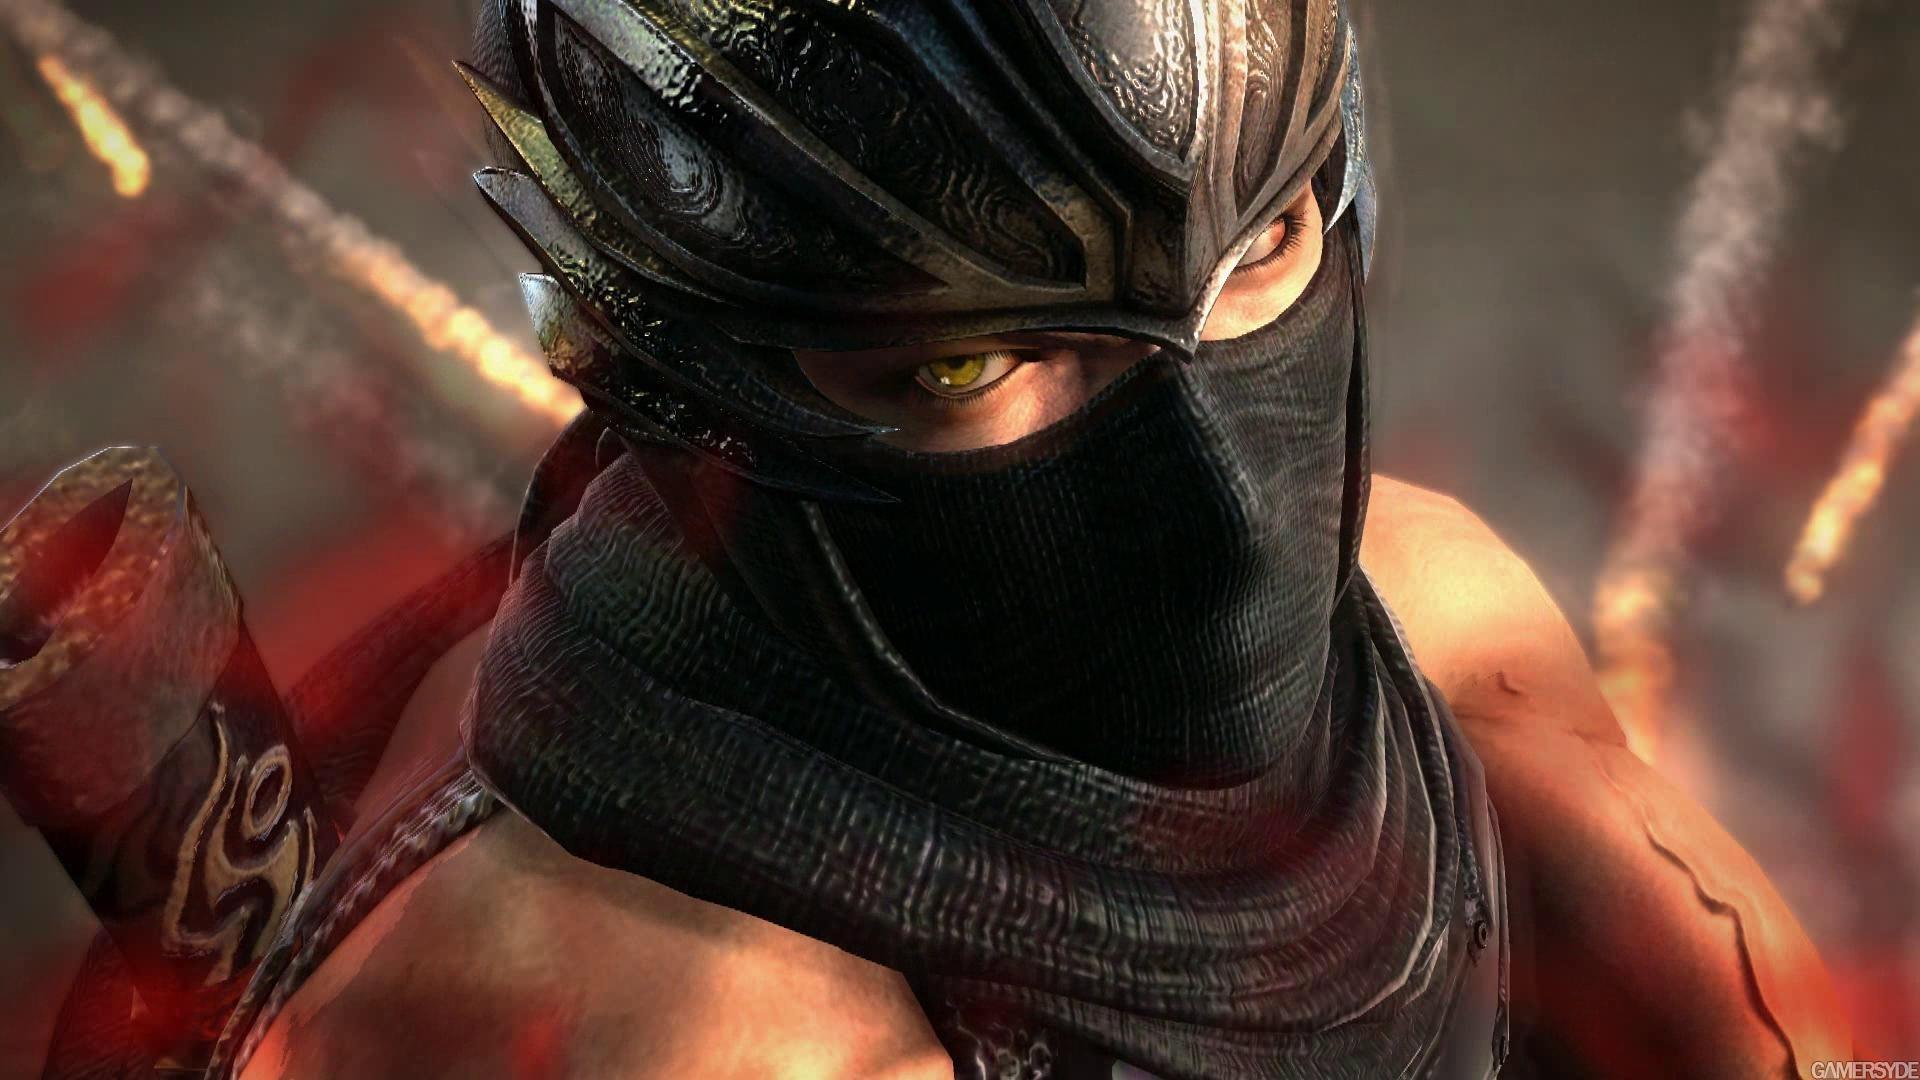 Spiele im Mai: Ninja Gaiden 3, Diablo III, Trails Evolution, Prototype 2, Max Payne 3